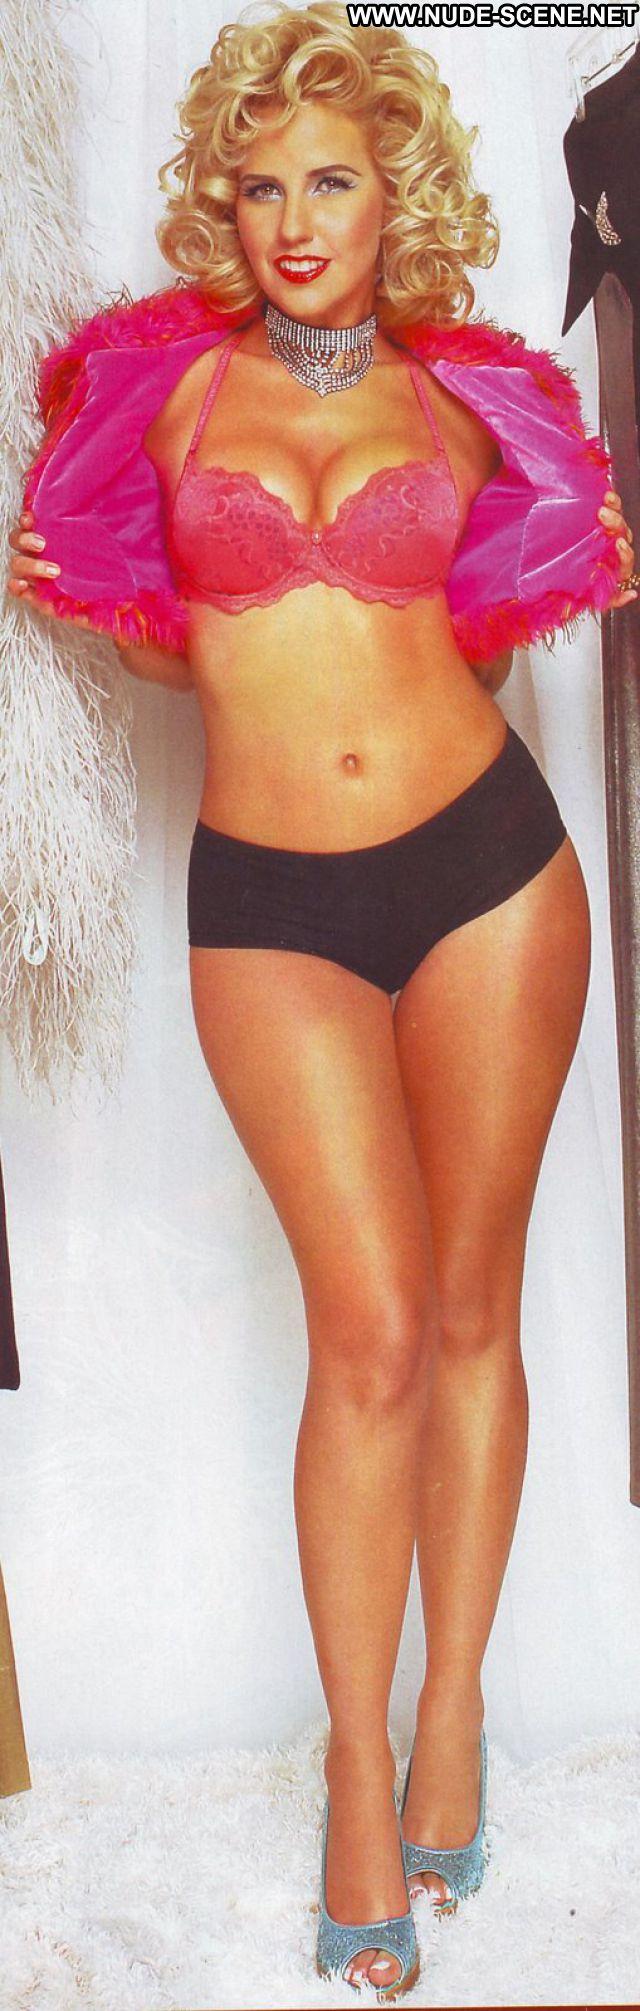 Raquel Bigorra Blonde Blue Eyes Celebrity Nude Scene Posing Hot Nude